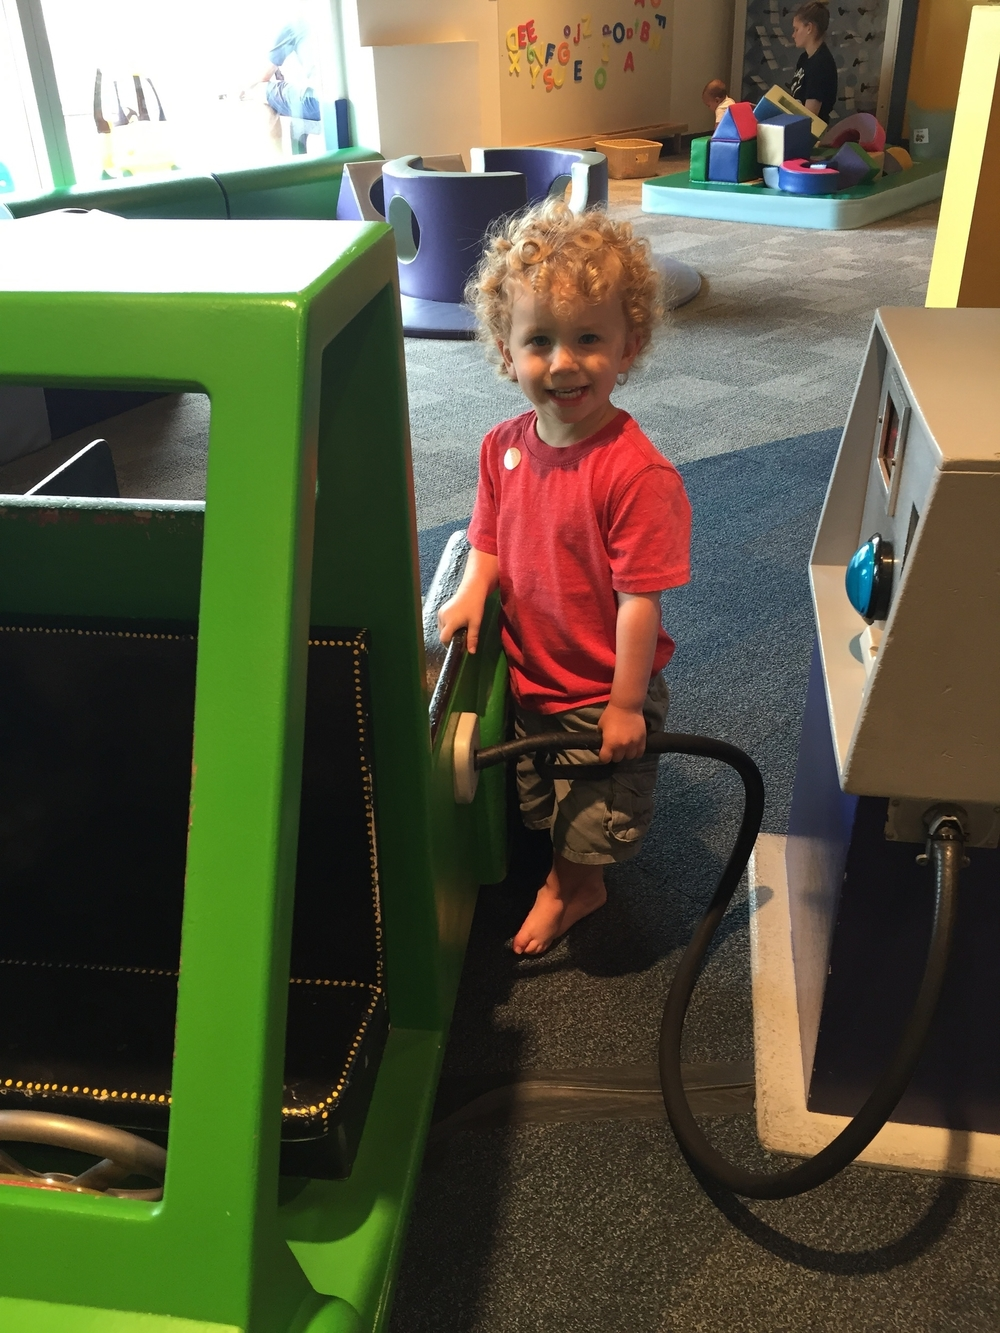 Recent visit to the Houston Children's Museum